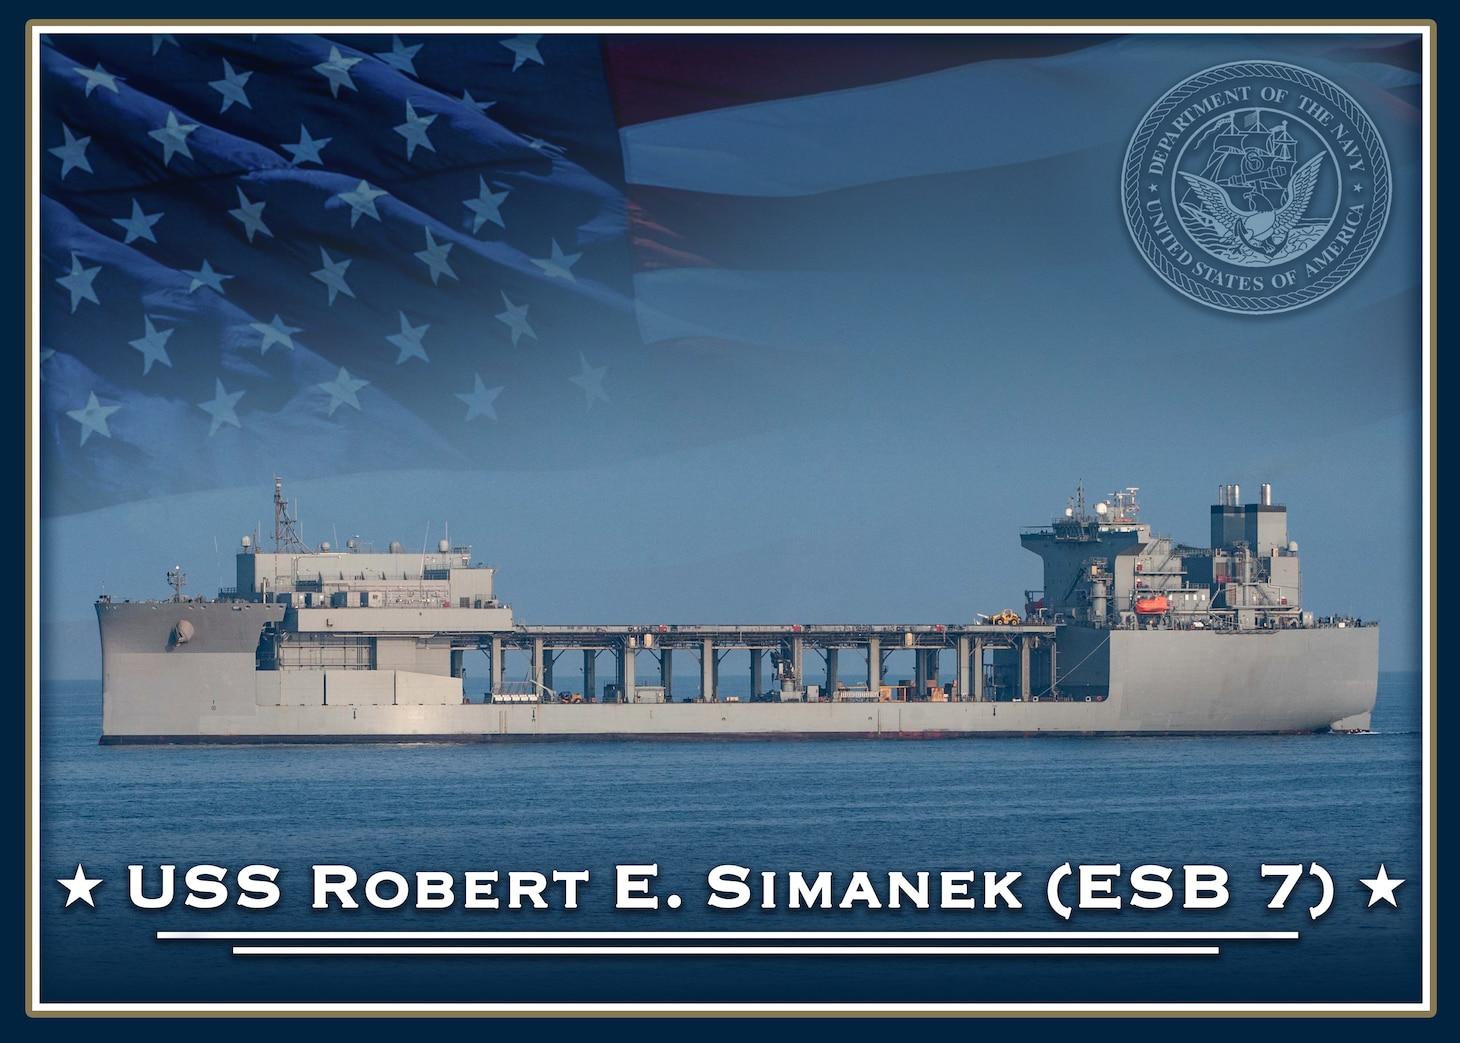 The future expeditionary sea base USS Robert E. Simanek (ESB 7).